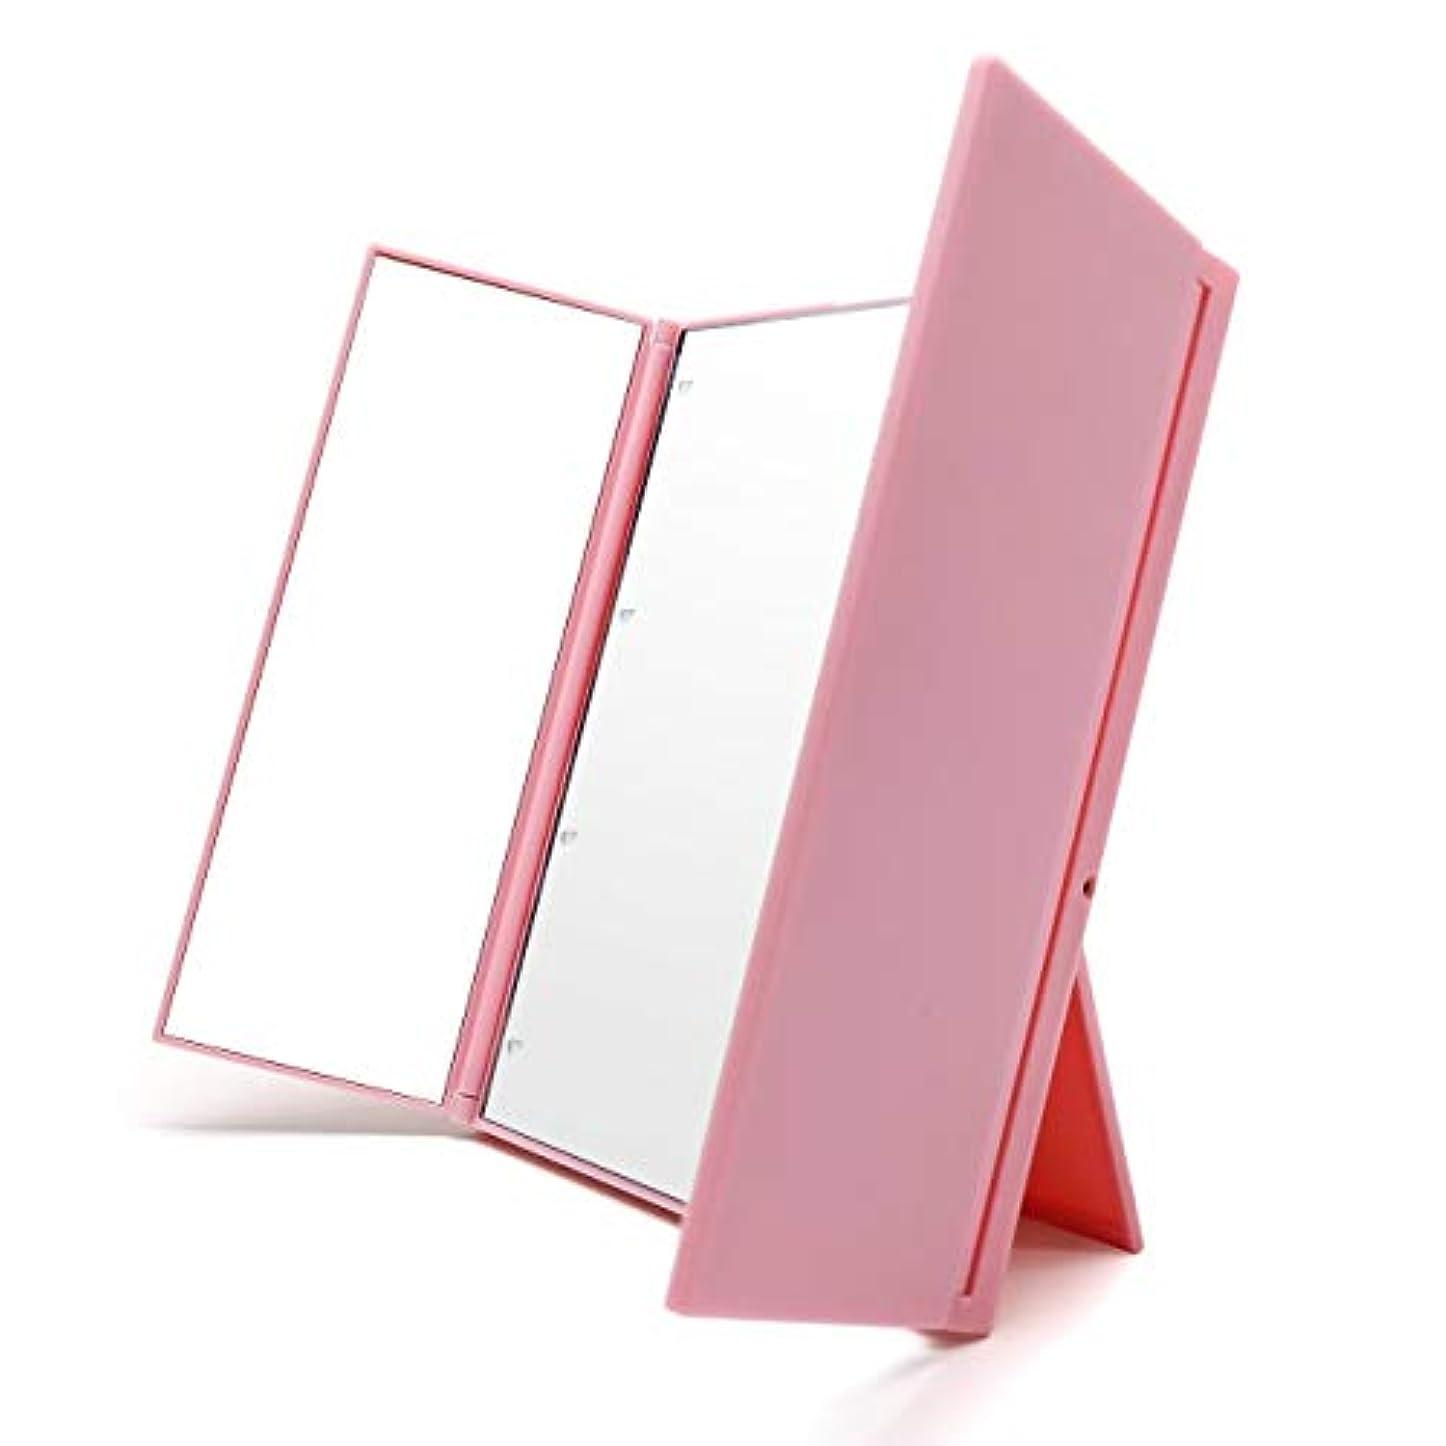 Vidgoo 鏡 卓上 スタンドミラー LED 化粧鏡 三面鏡 女優ミラー 折り畳み式 電池型 携帯便利(ピンク)